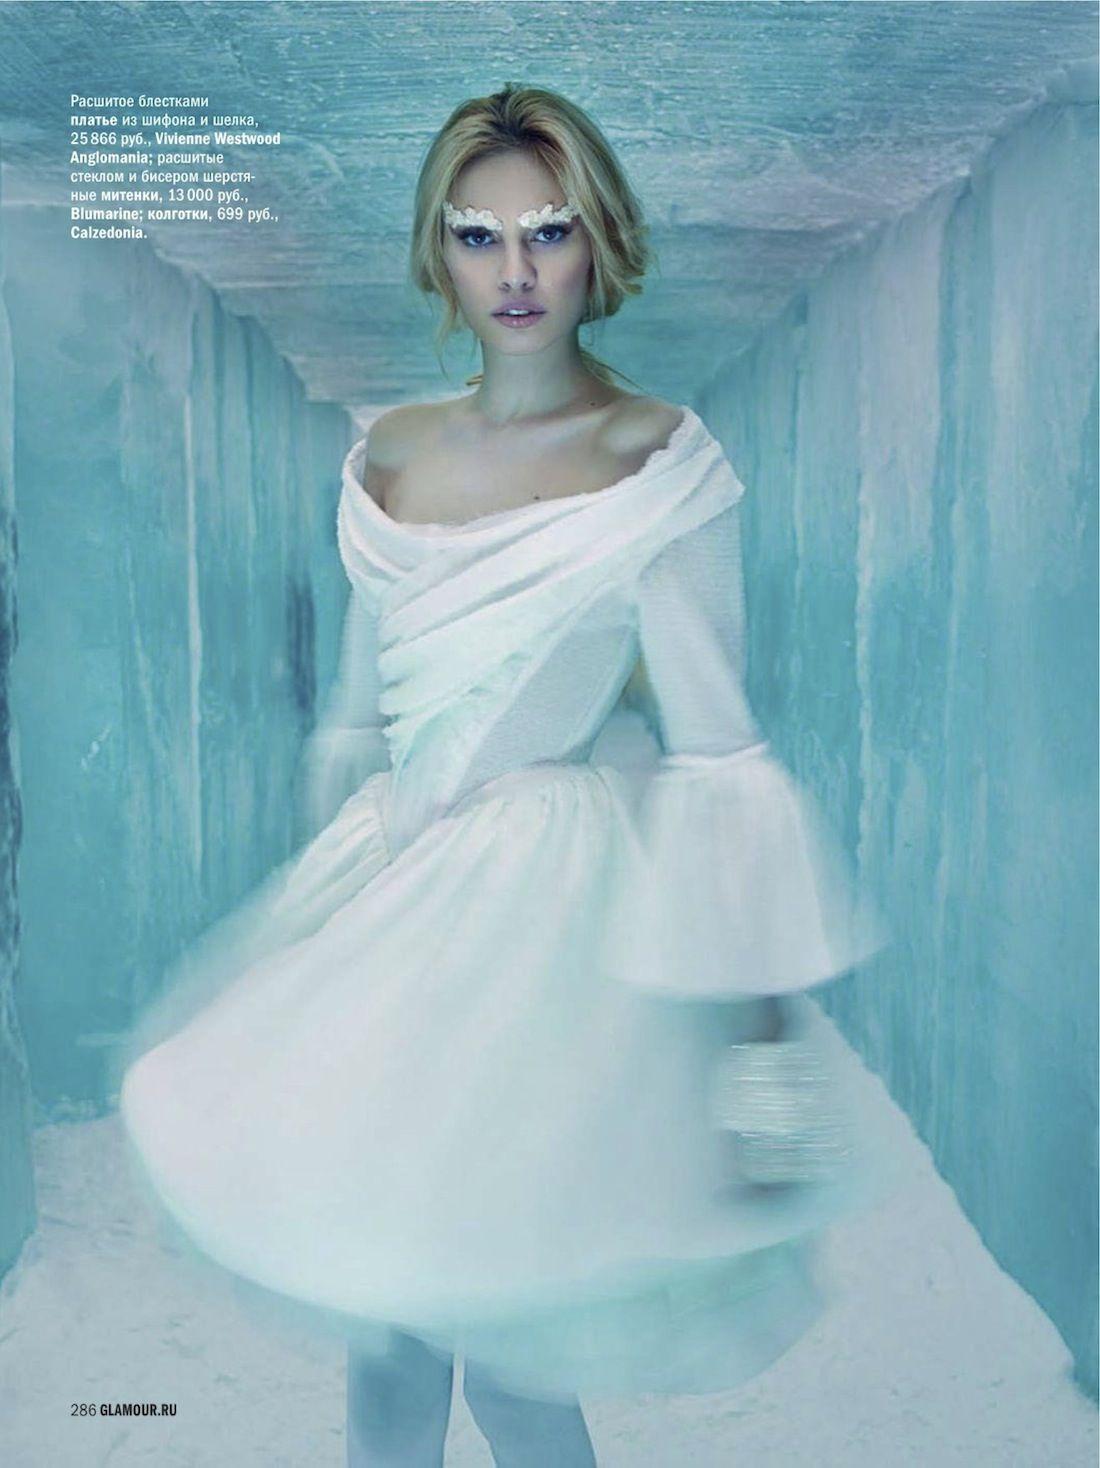 visual optimism; fashion editorials, shows, campaigns & more!: masha kirsanova by henrik halvarsson for glamour russia december 2012